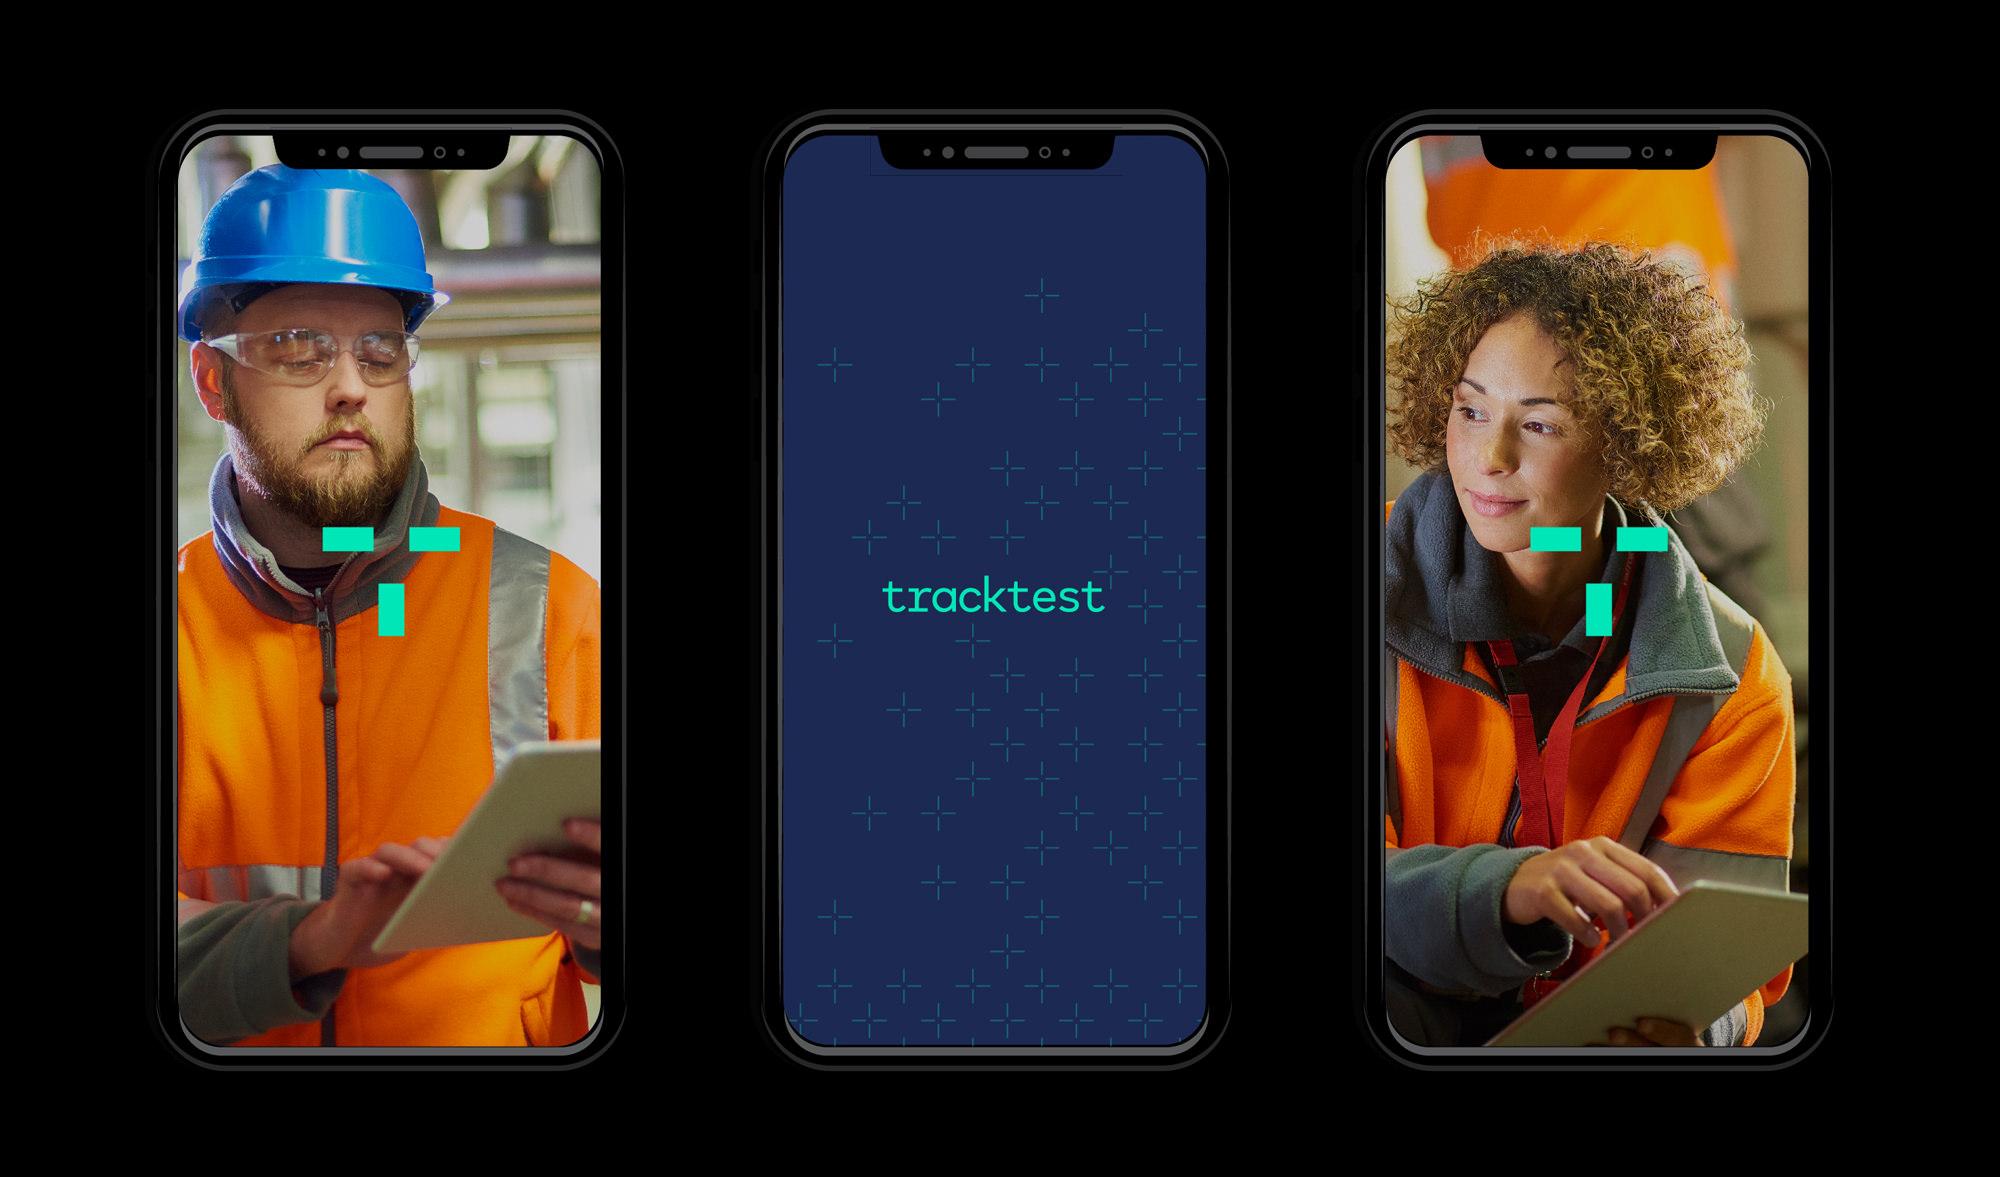 tracktest logo phones